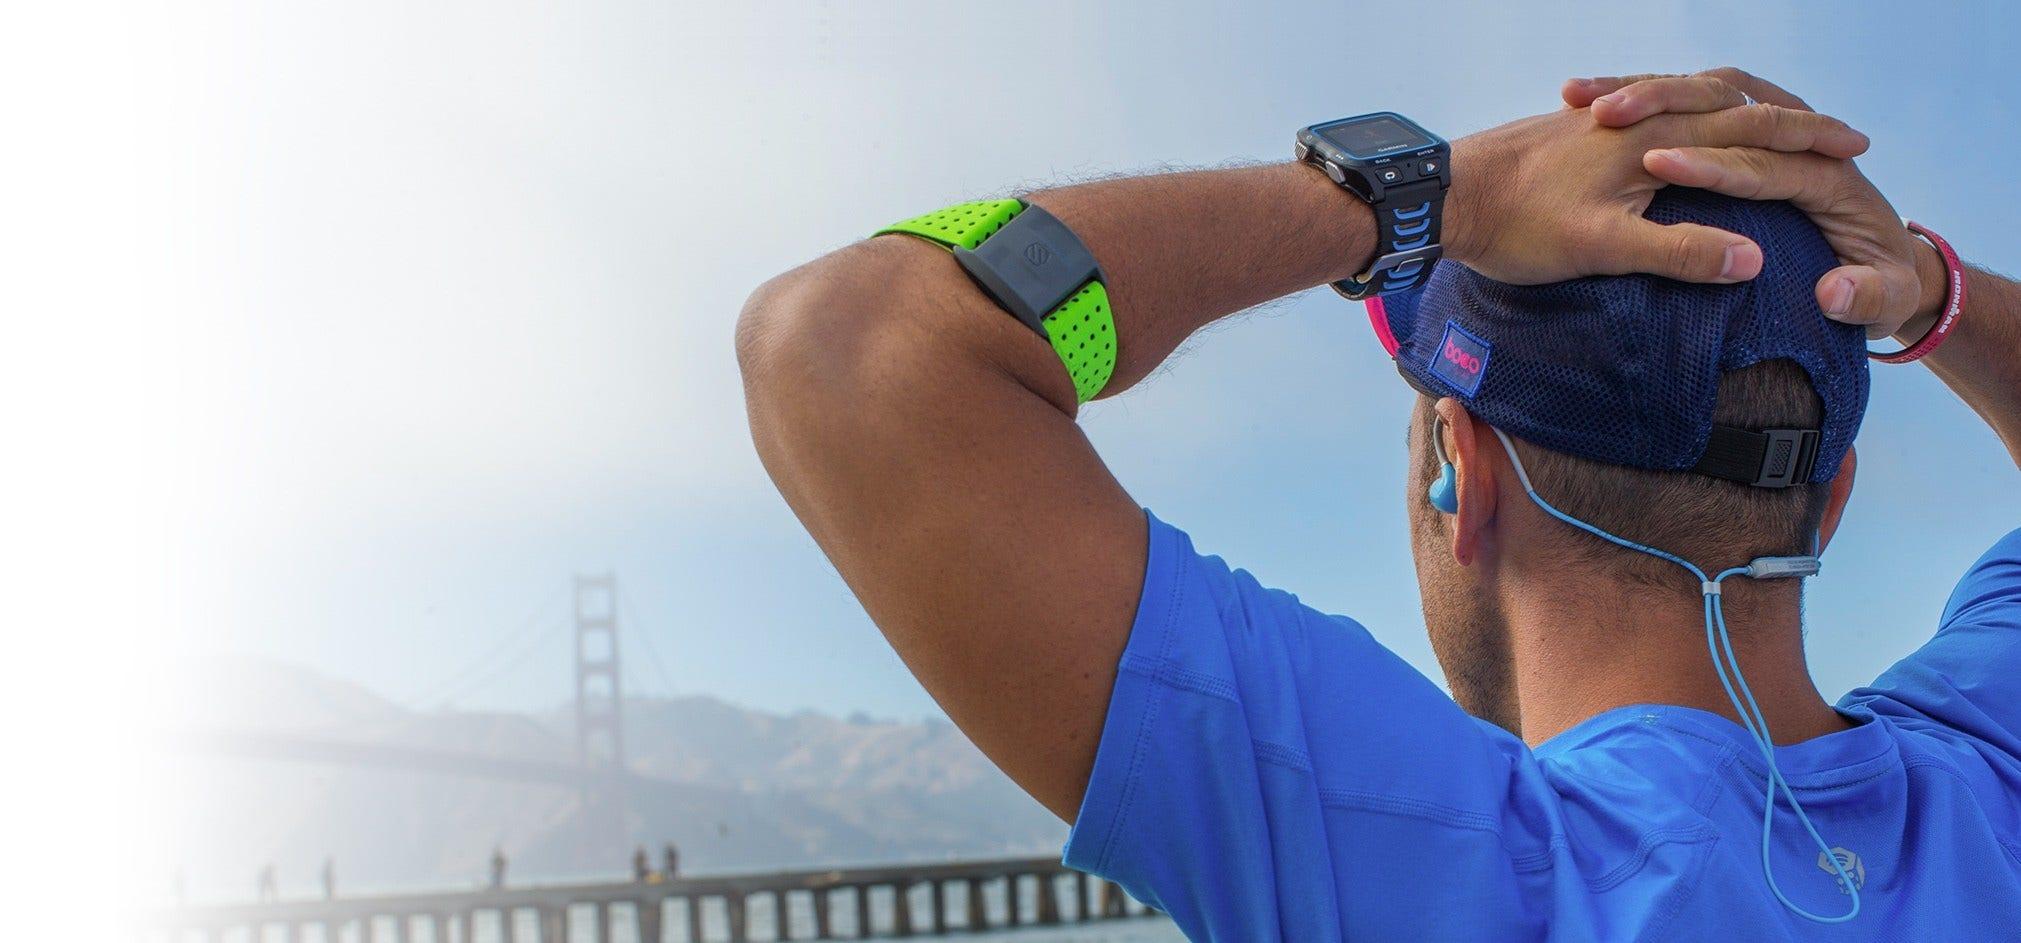 Scosche Health and Fitness Rhythm Sportclip AIR